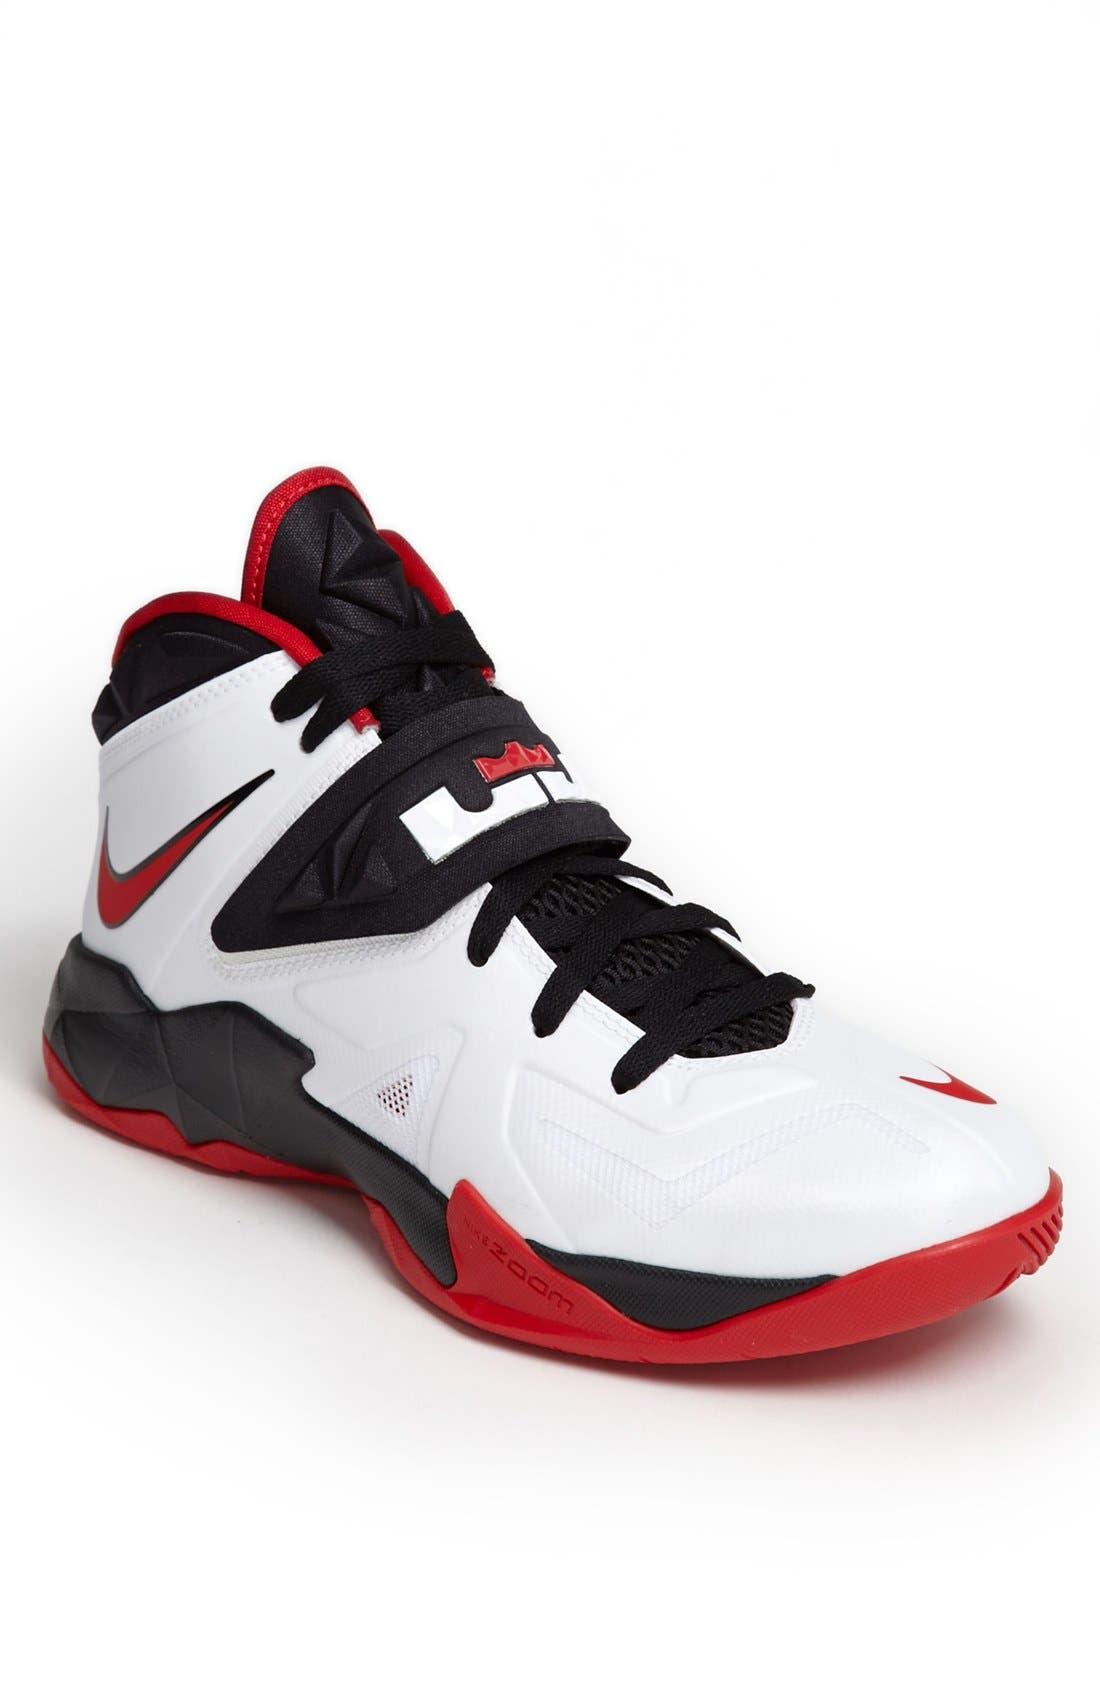 Alternate Image 1 Selected - Nike 'Lebron Zoom Soldier VII' Basketball Shoe (Men)